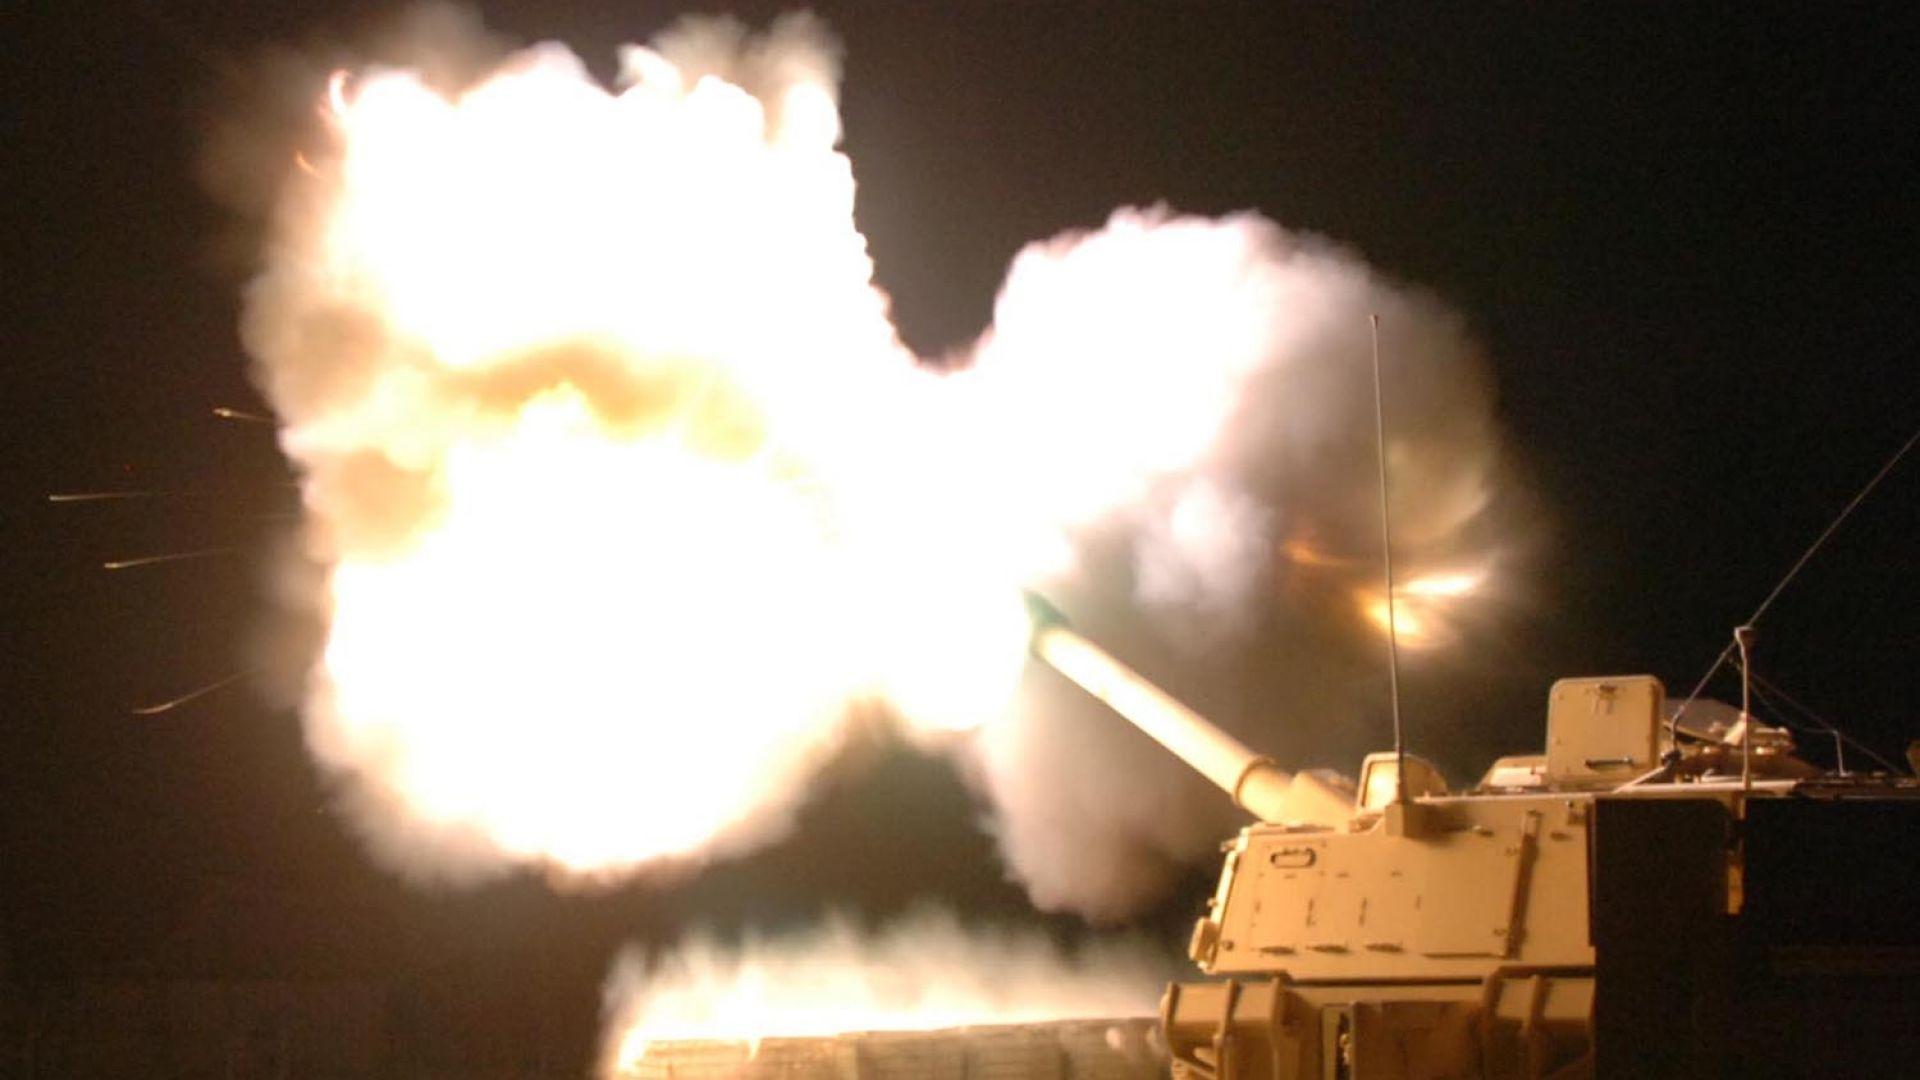 САЩ ще свалят ракети с хиперзвукови снаряди